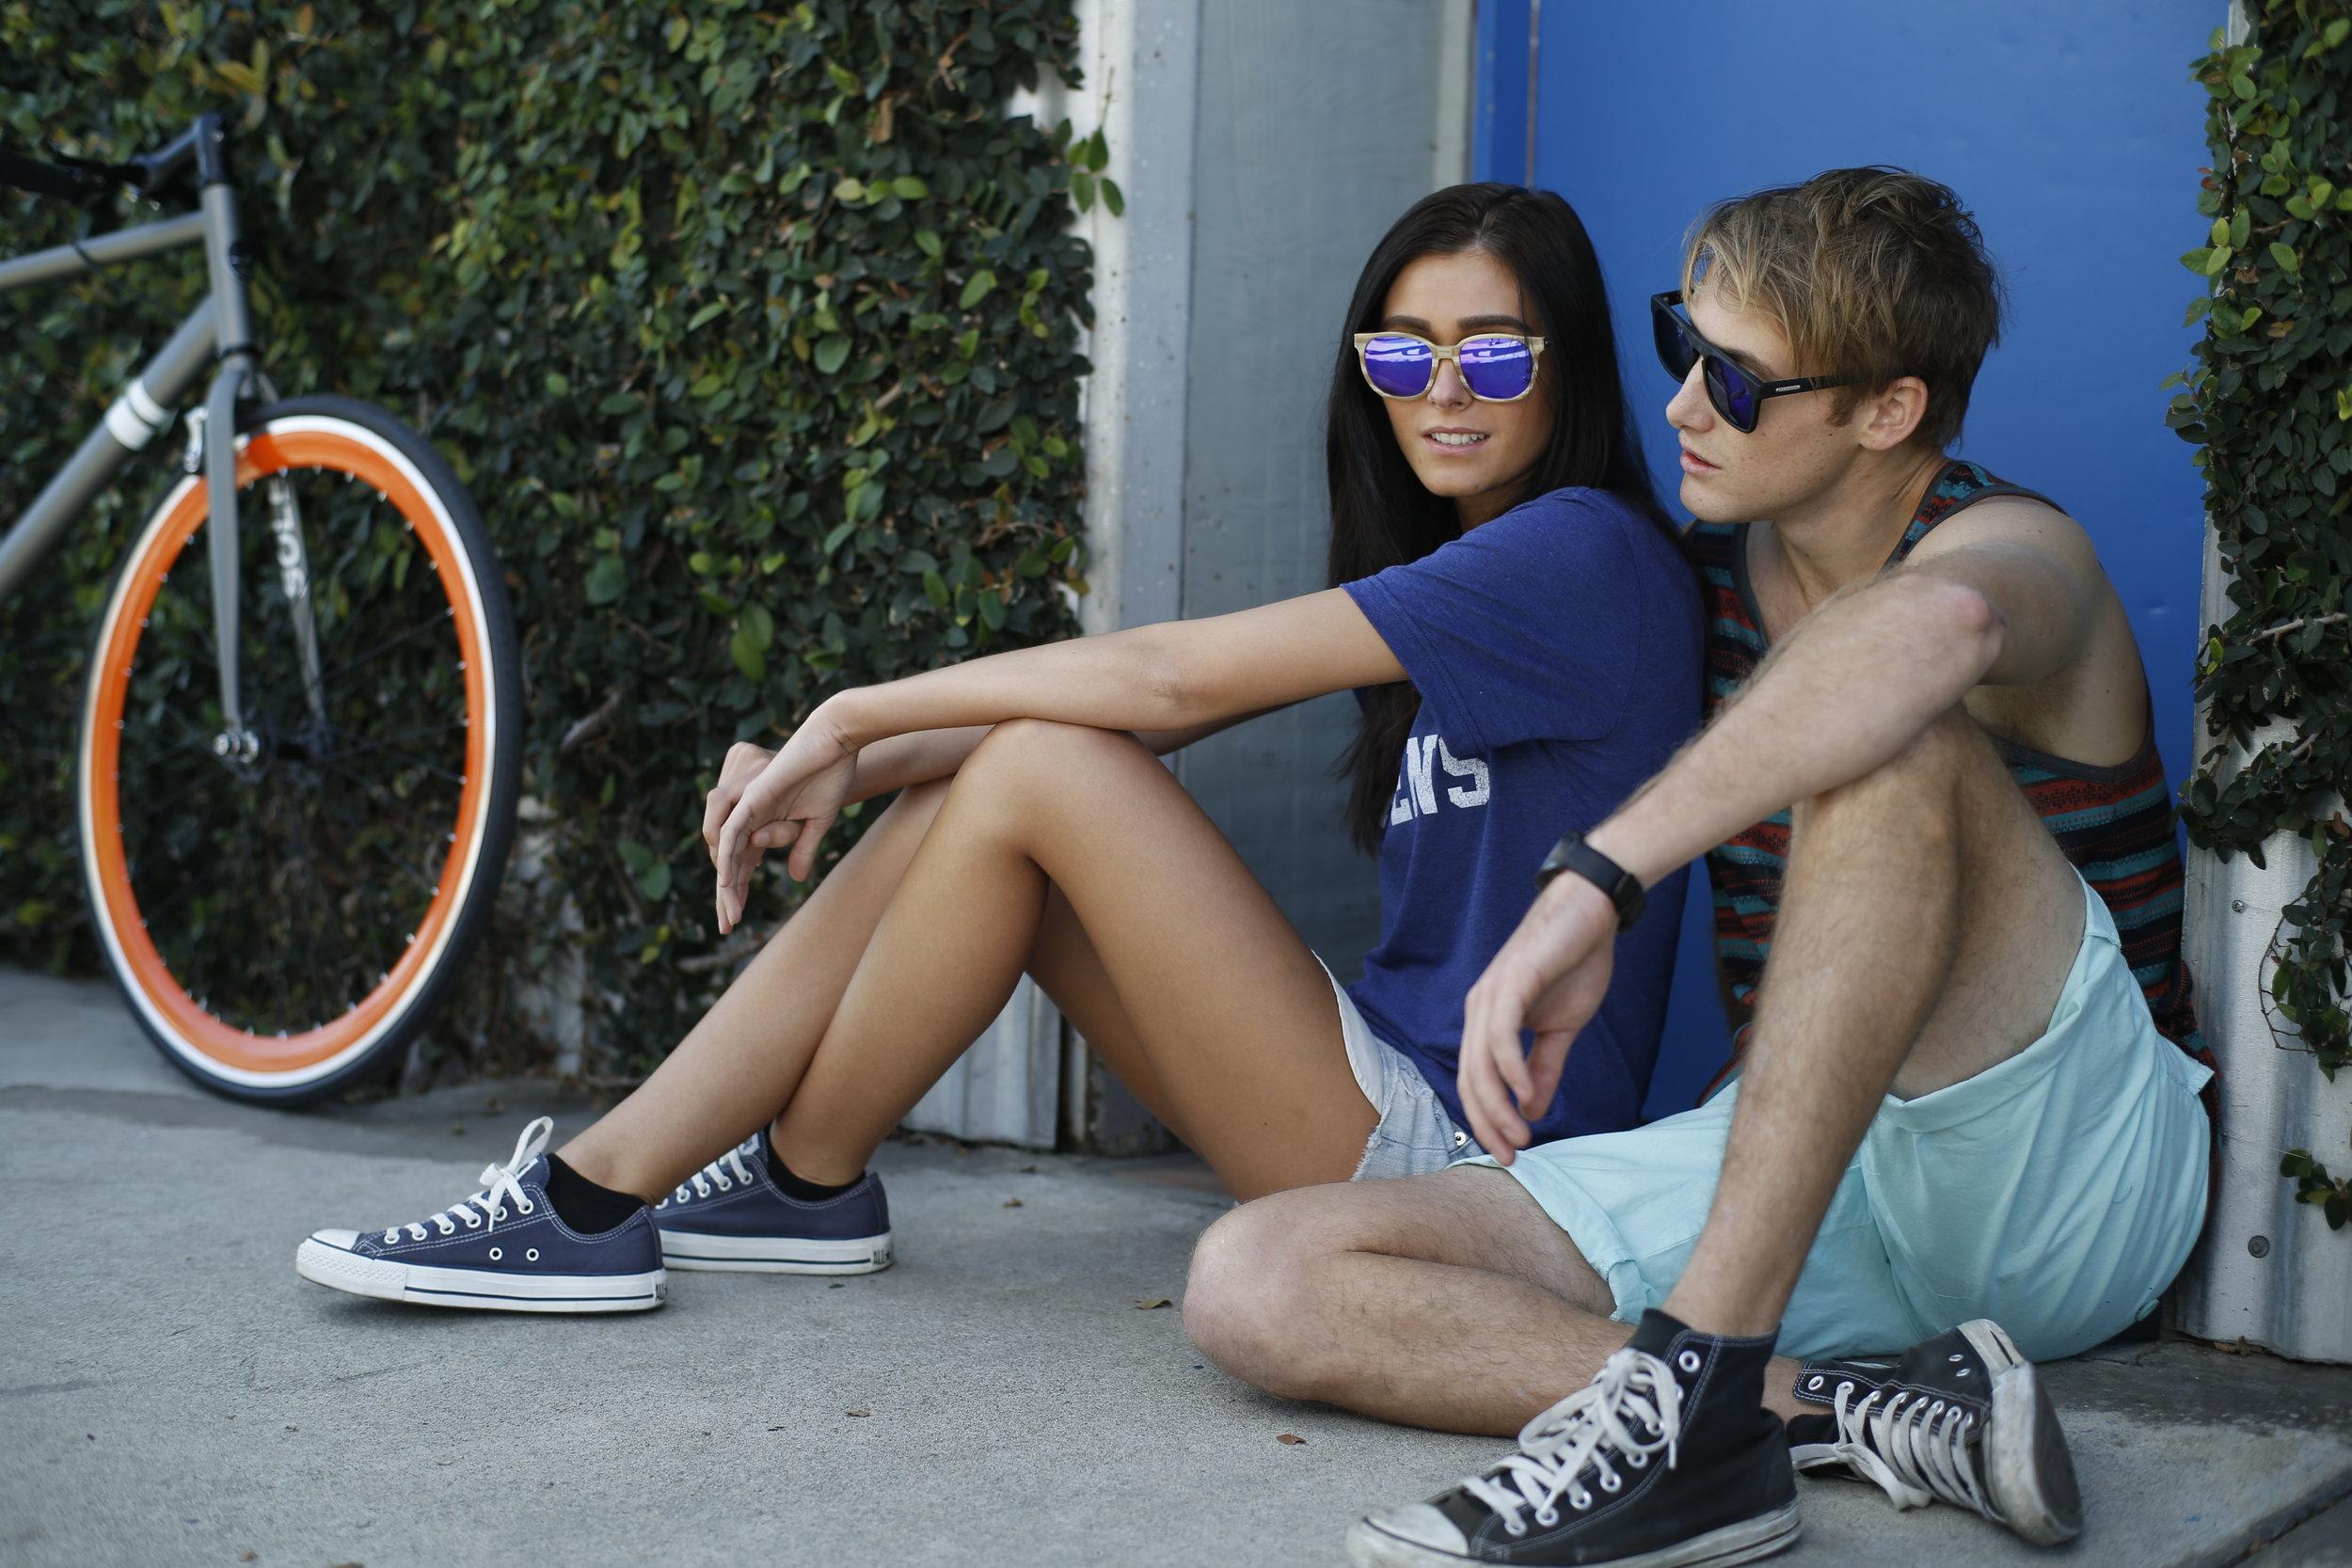 sunglasses ben_micaela .jpg